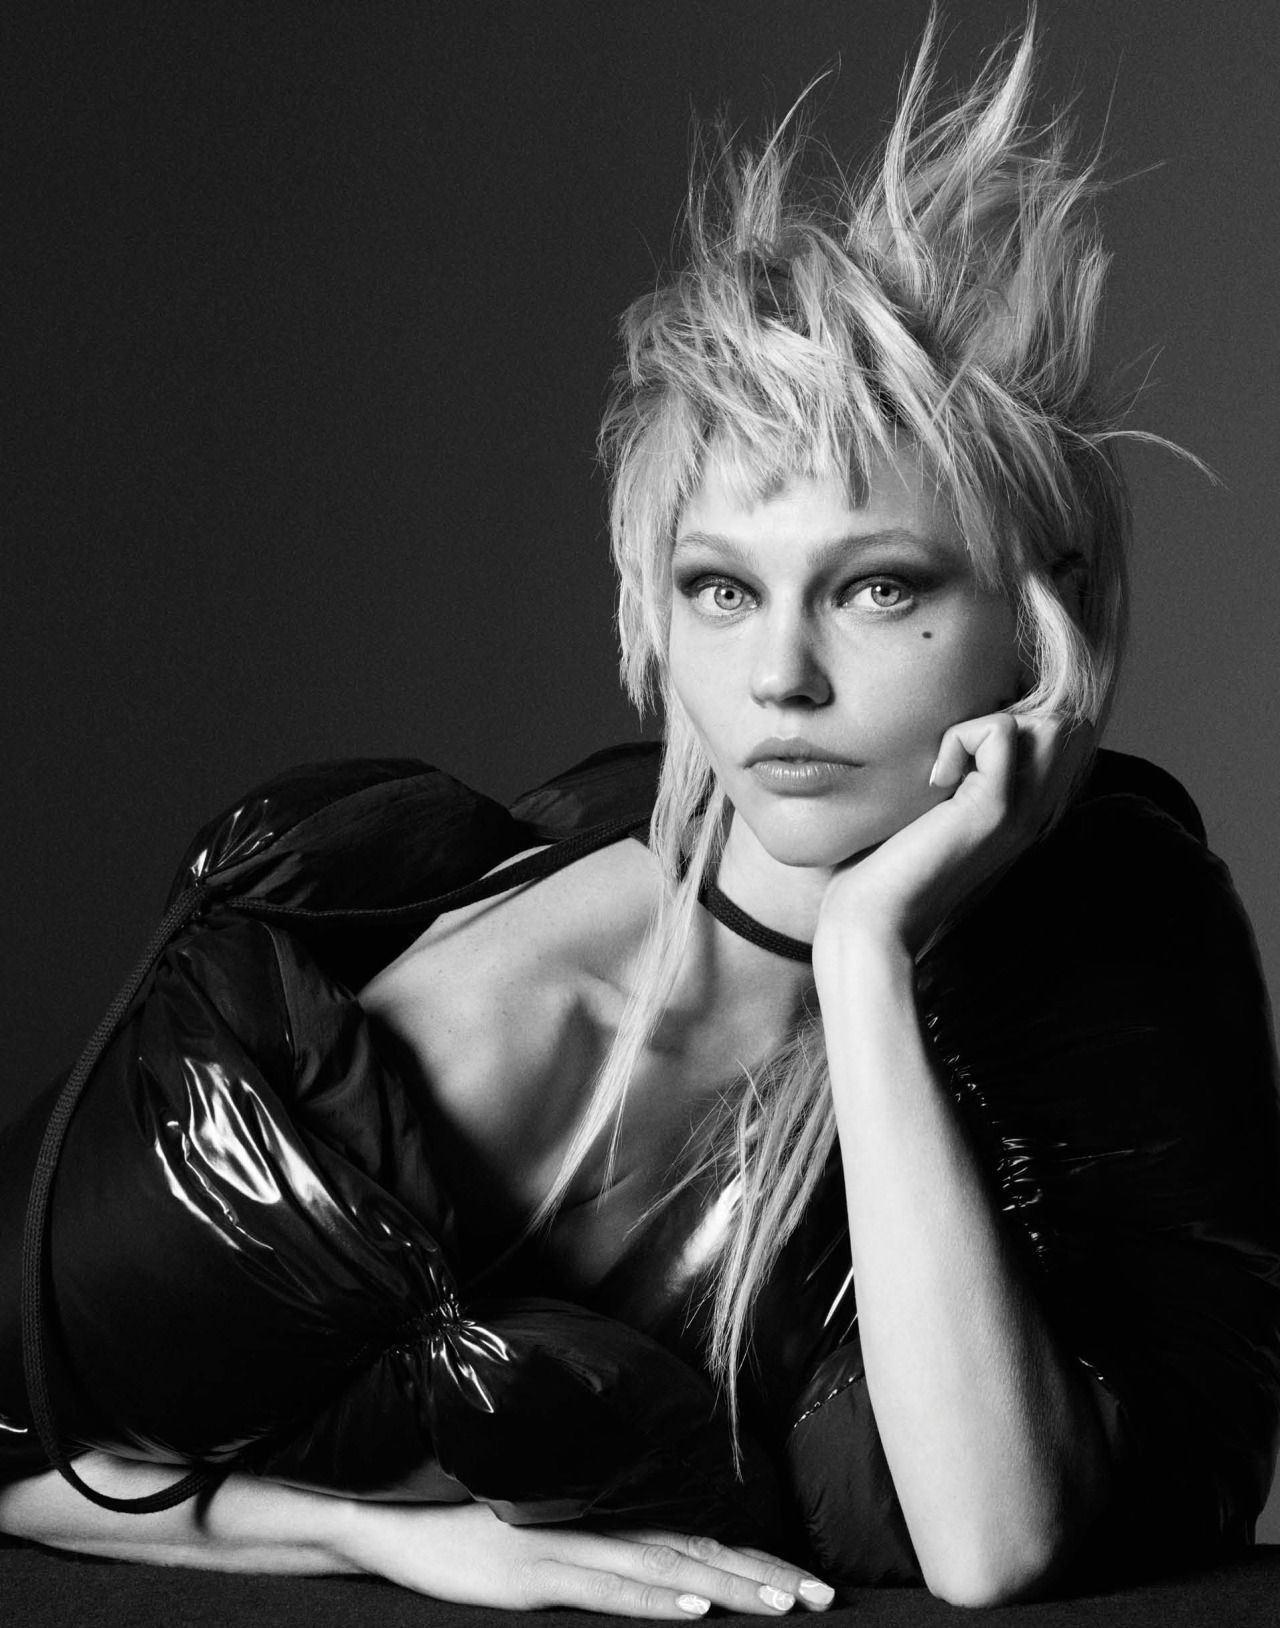 Publication: CR Fashion Book Fall/Winter 2016 Model: Sasha Pivovarova Photographer: Rory